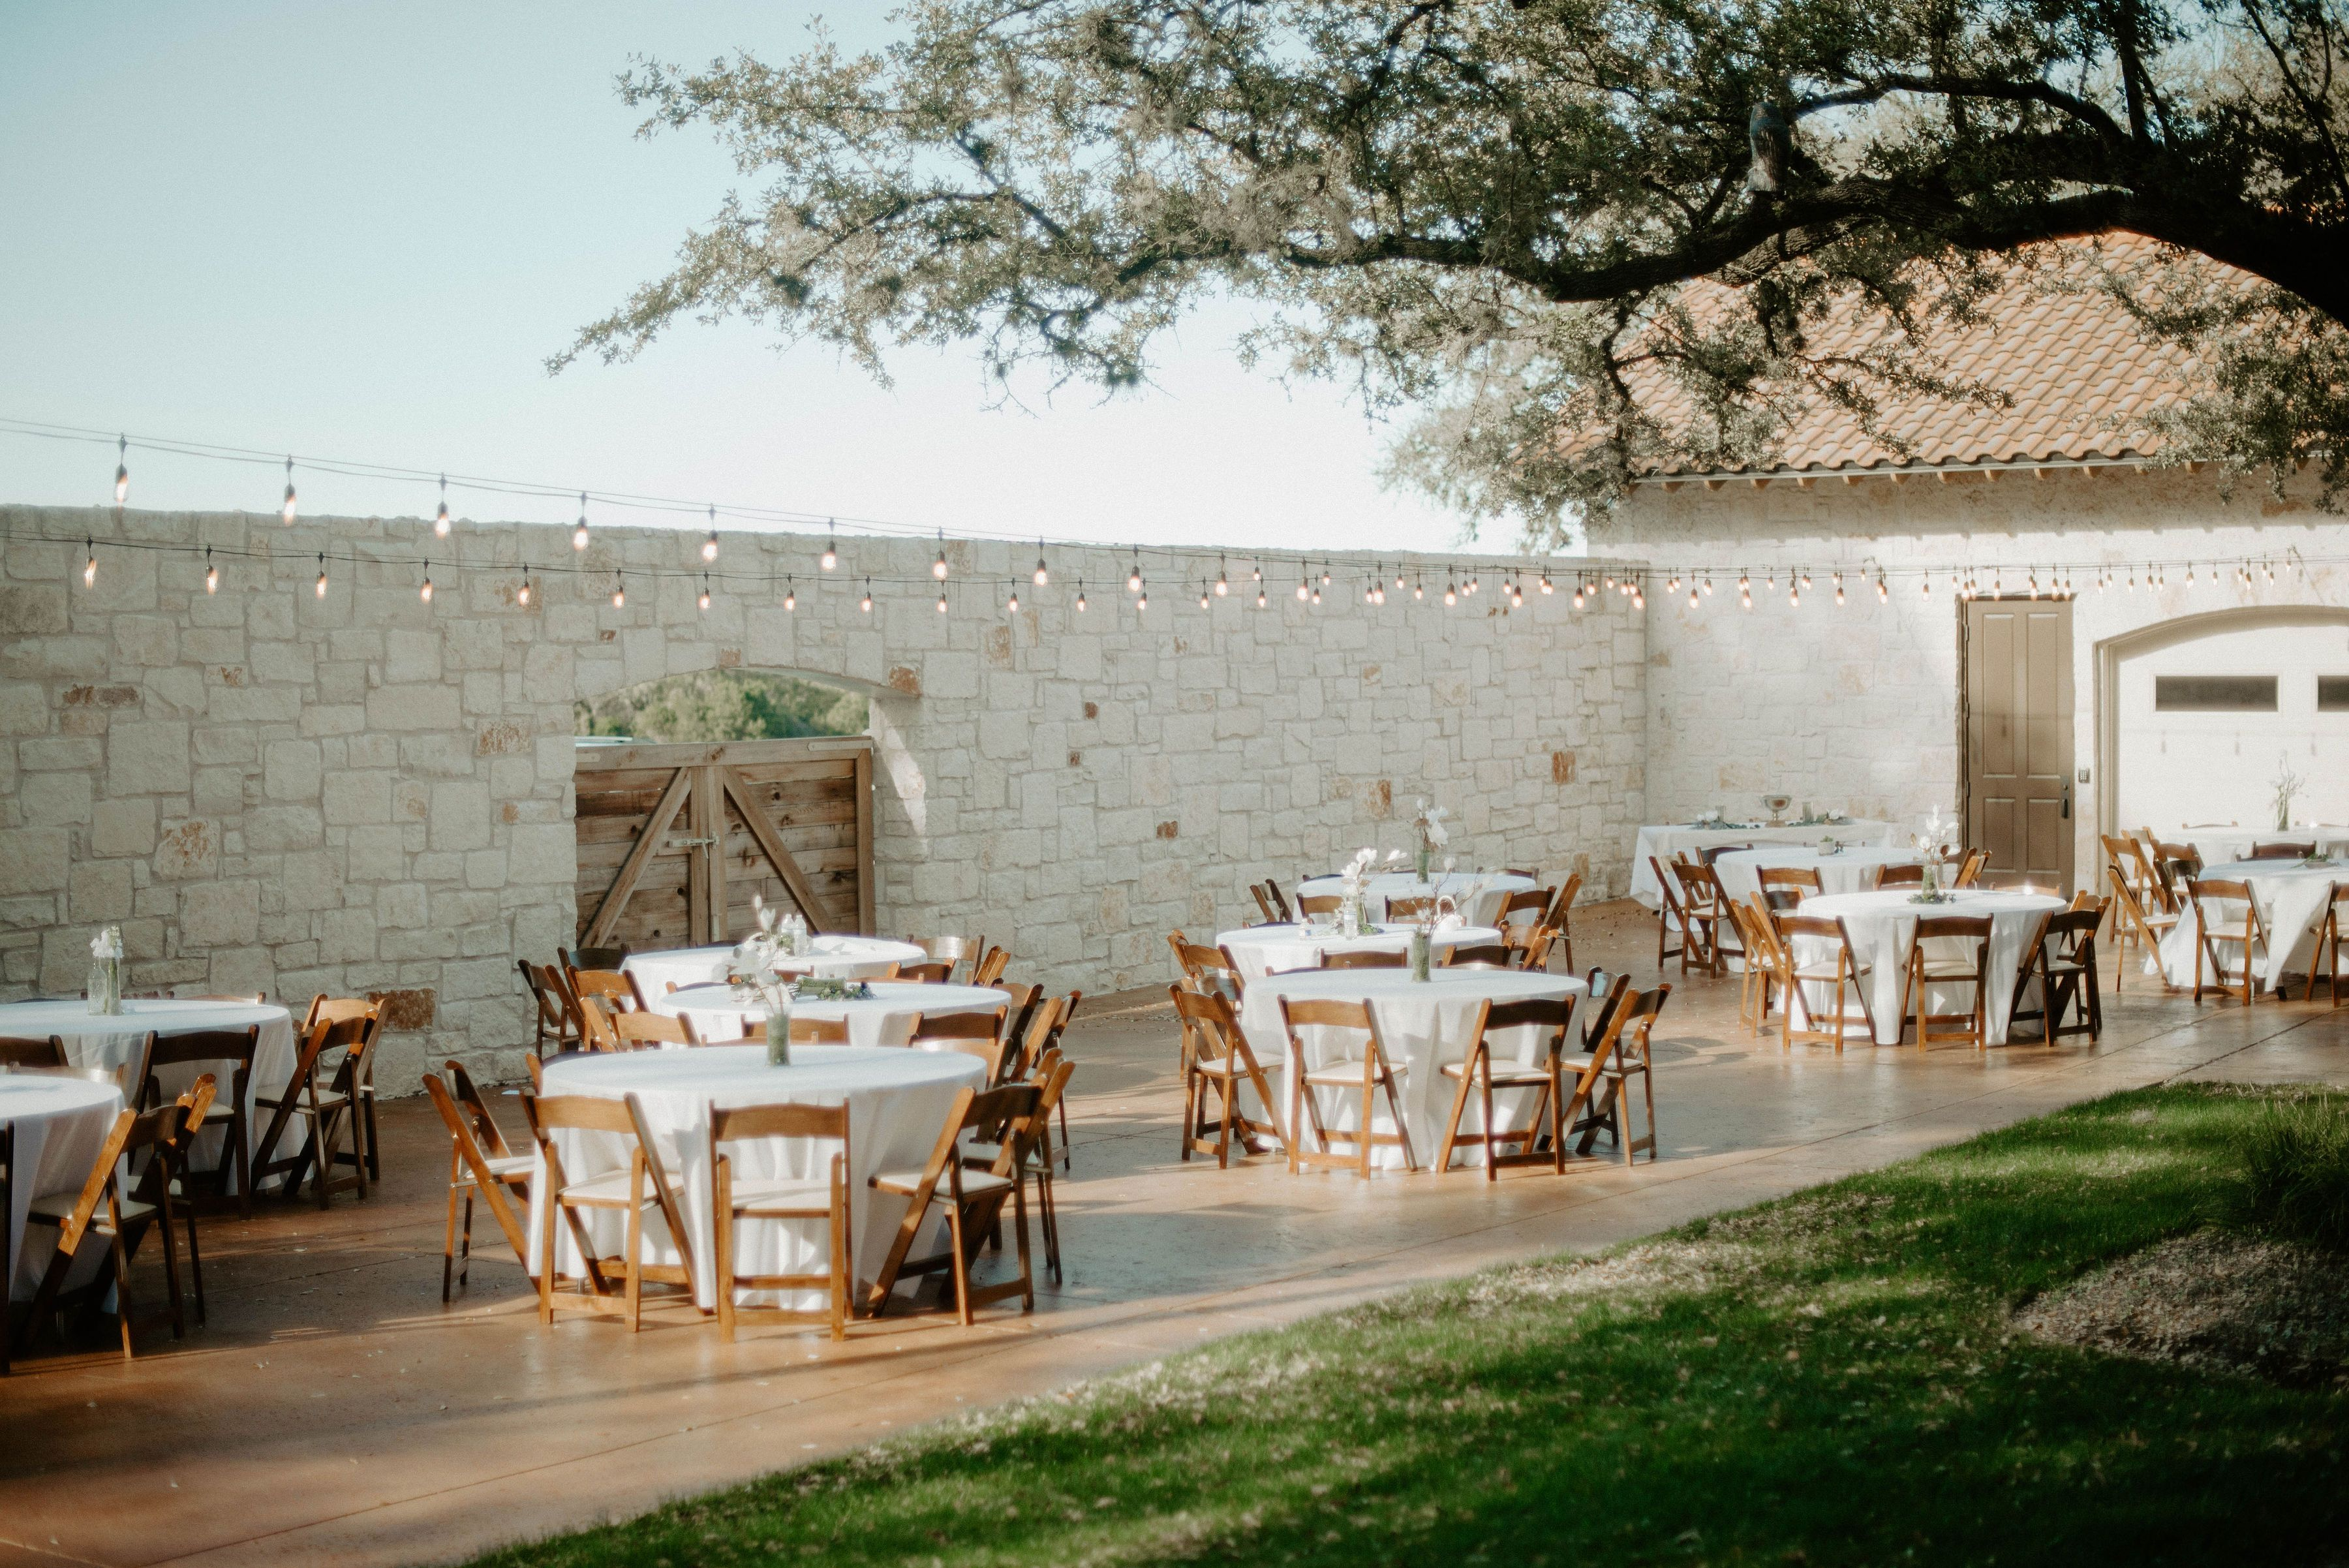 Outdoor Wedding Reception At The Courtyard Garey House Georgetown Tx Wedding Venue In 2020 Outdoor Wedding Venues Outdoor Wedding Reception Wedding Venues Texas